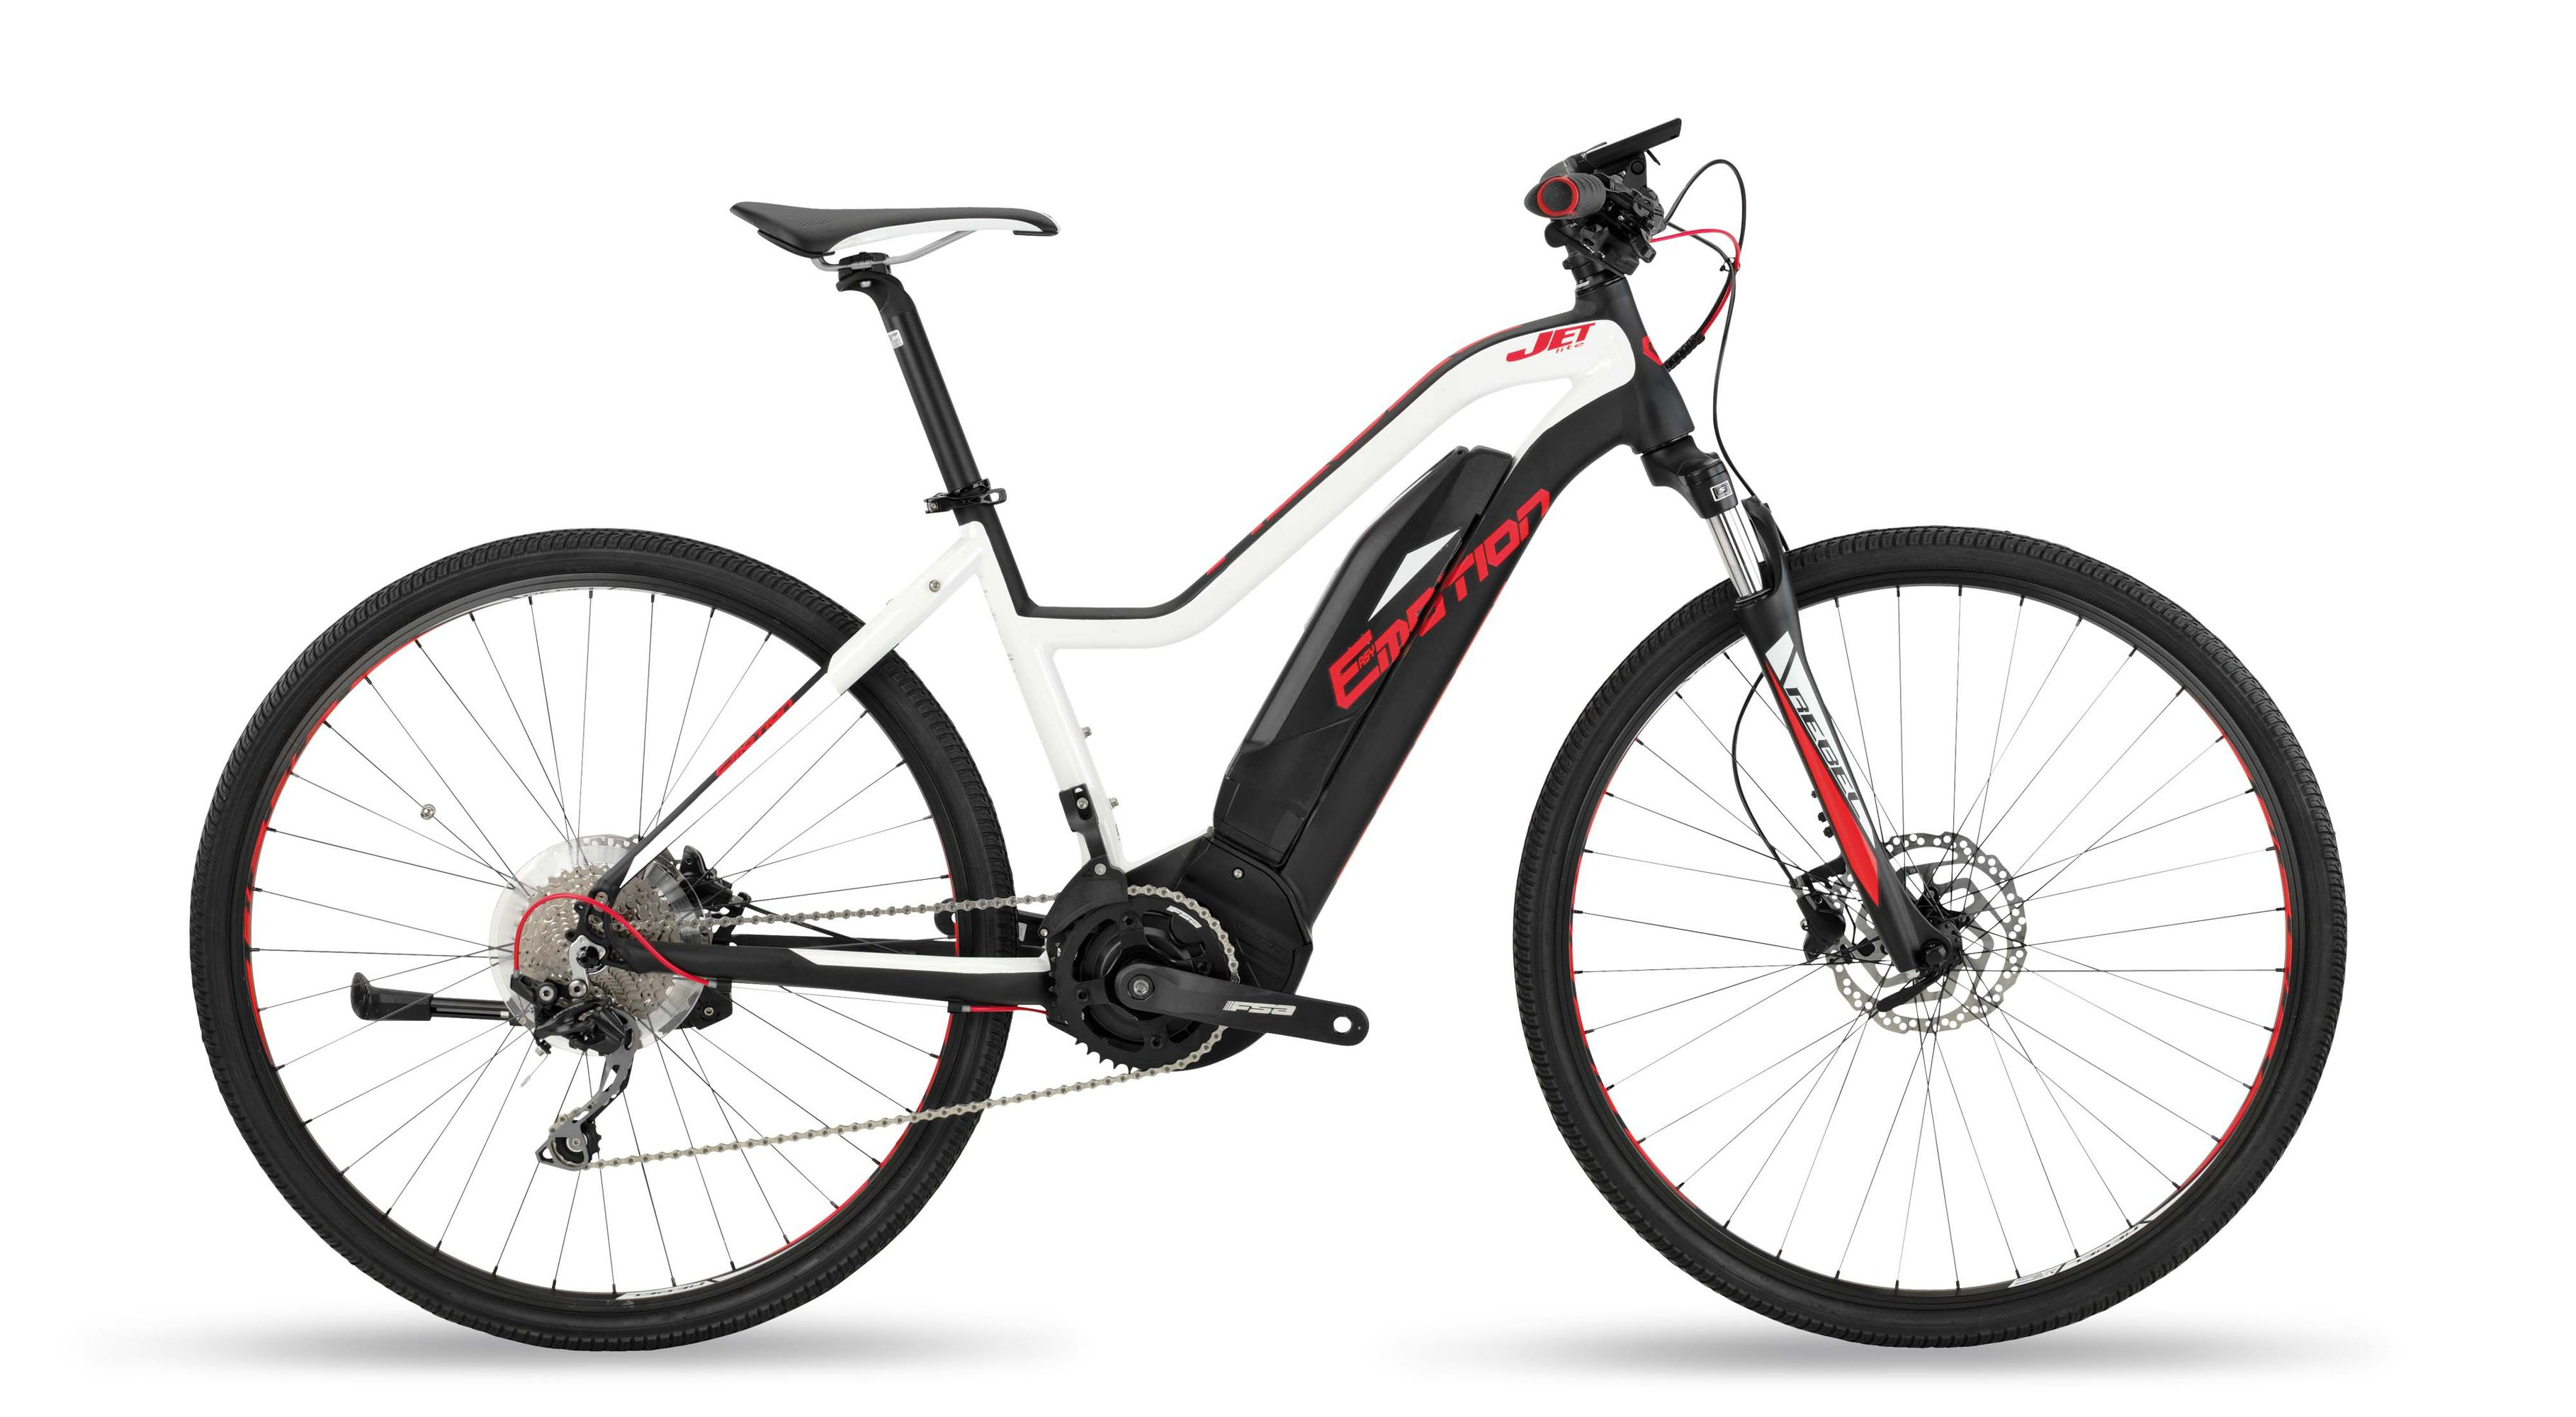 greenbike pesaro-BHbikes-MTB elettriche-Rebel Jet lite